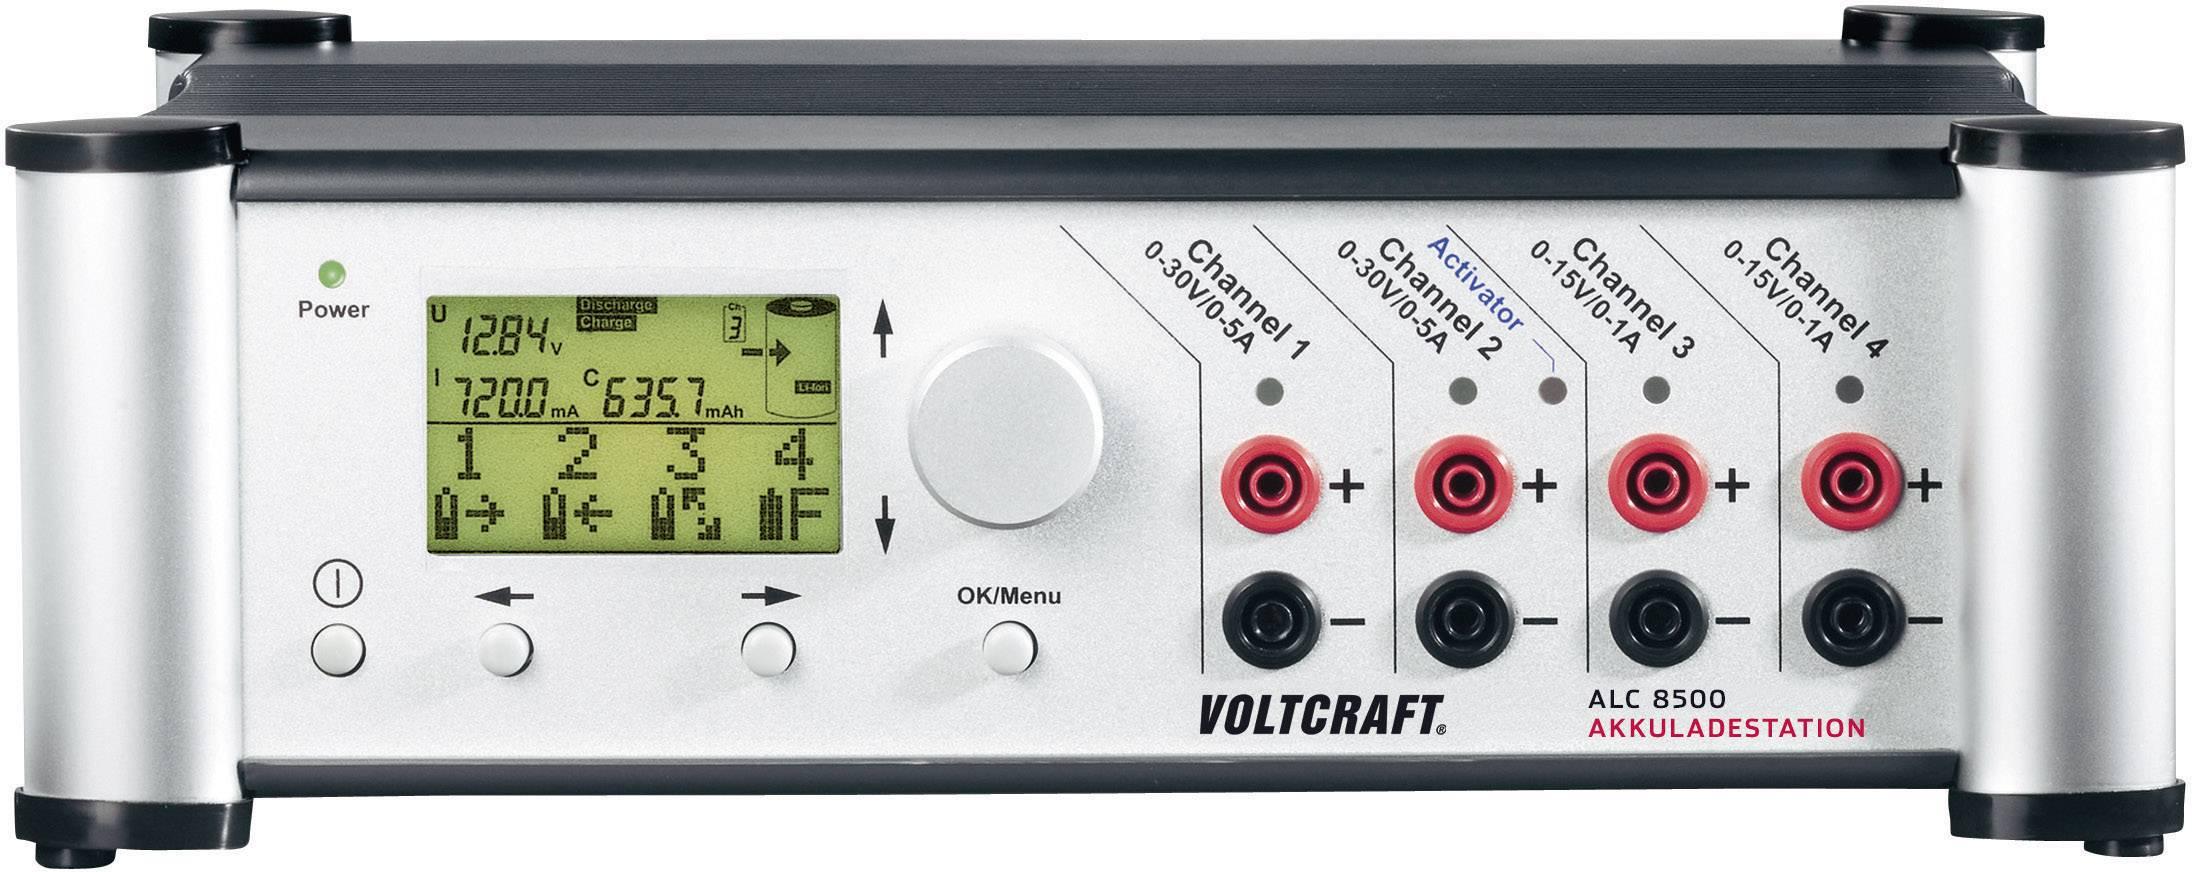 Nabíjacia stanica Voltcraft ALC 8500 Expert